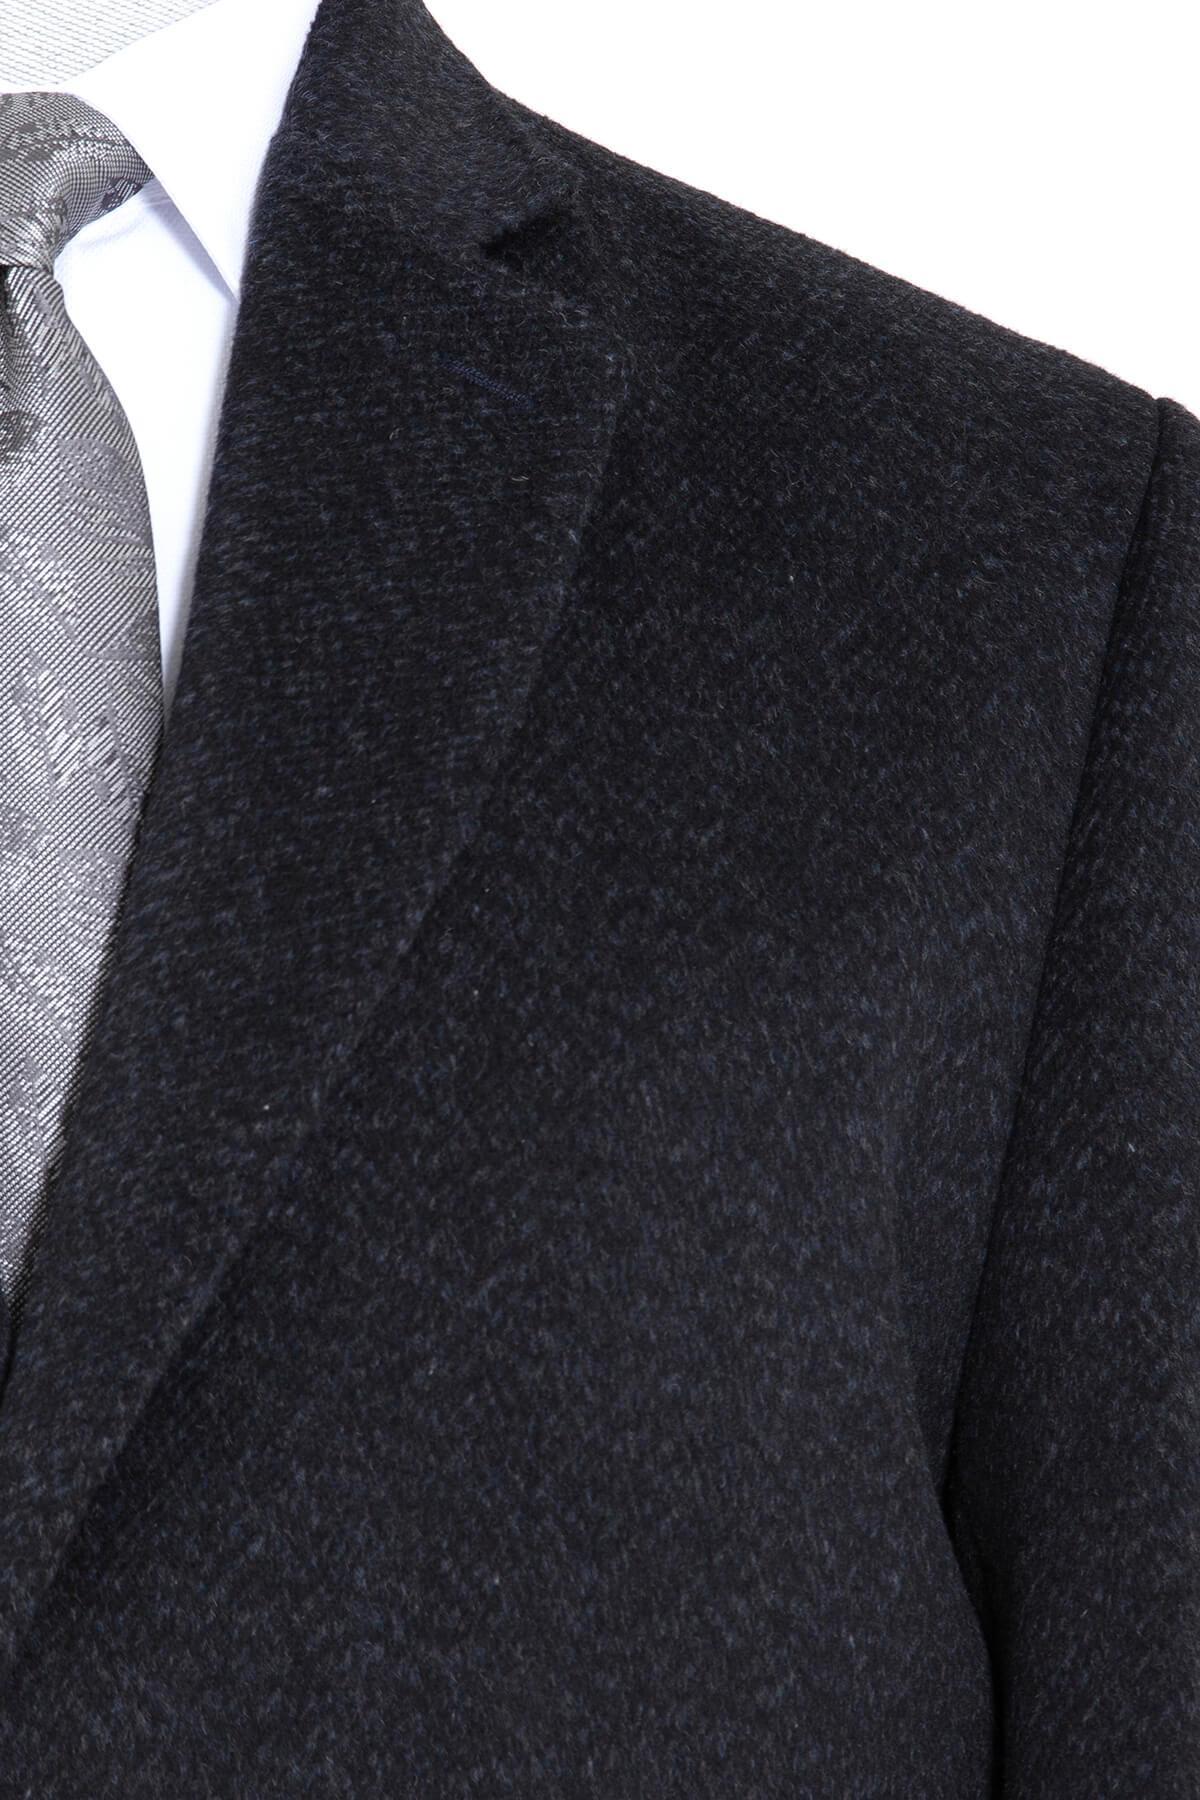 Lacivert Desenli Ceket Yaka Palto - Thumbnail